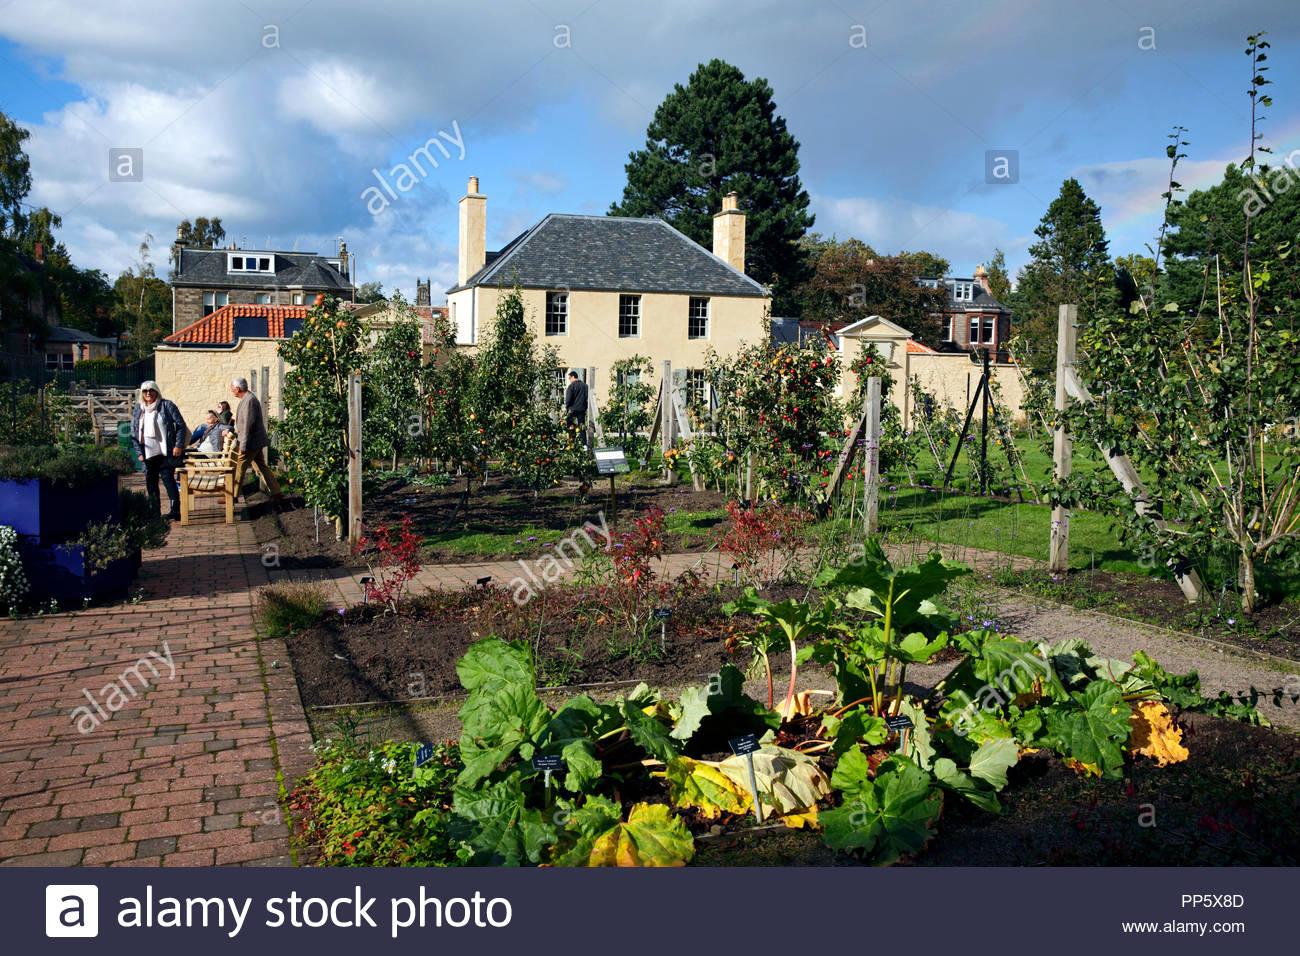 The Botanic Cottage at the Royal Botanic Garden in Edinburgh Scotland - Stock Image